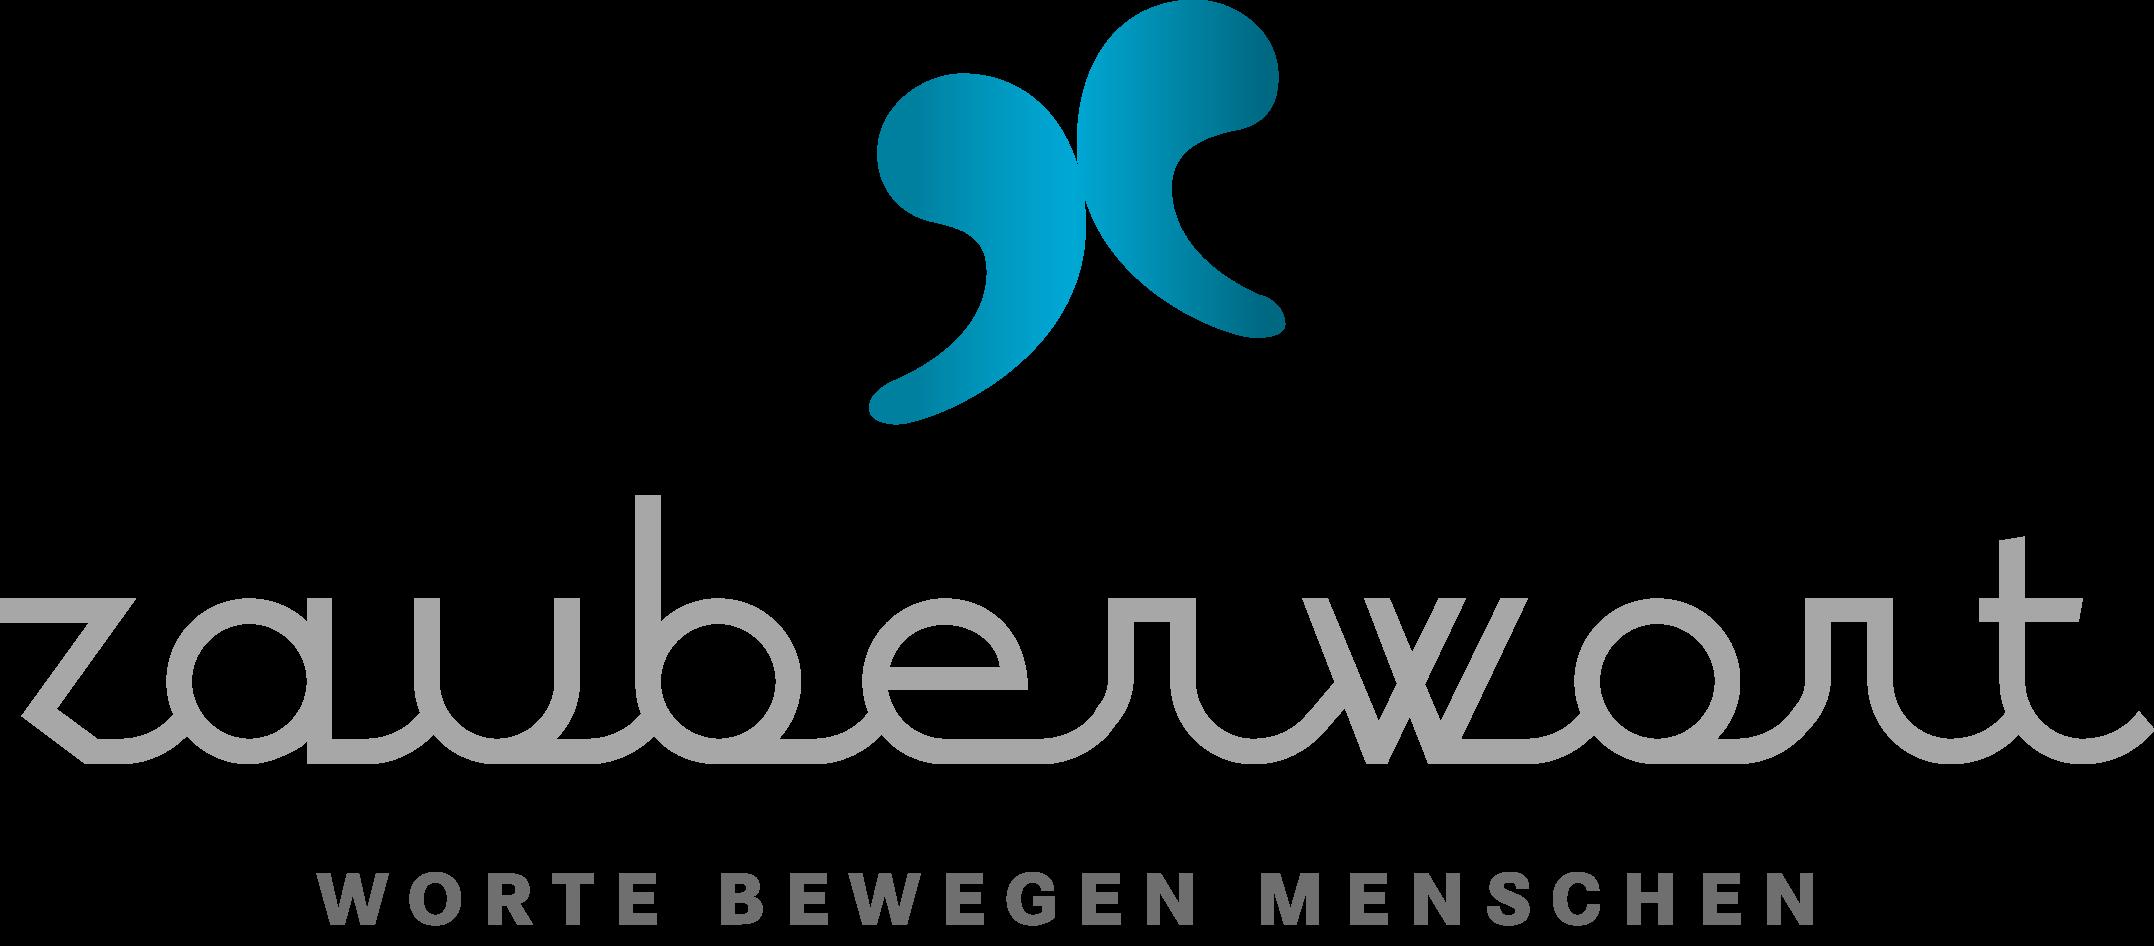 zauberwort_logo_vector_blau